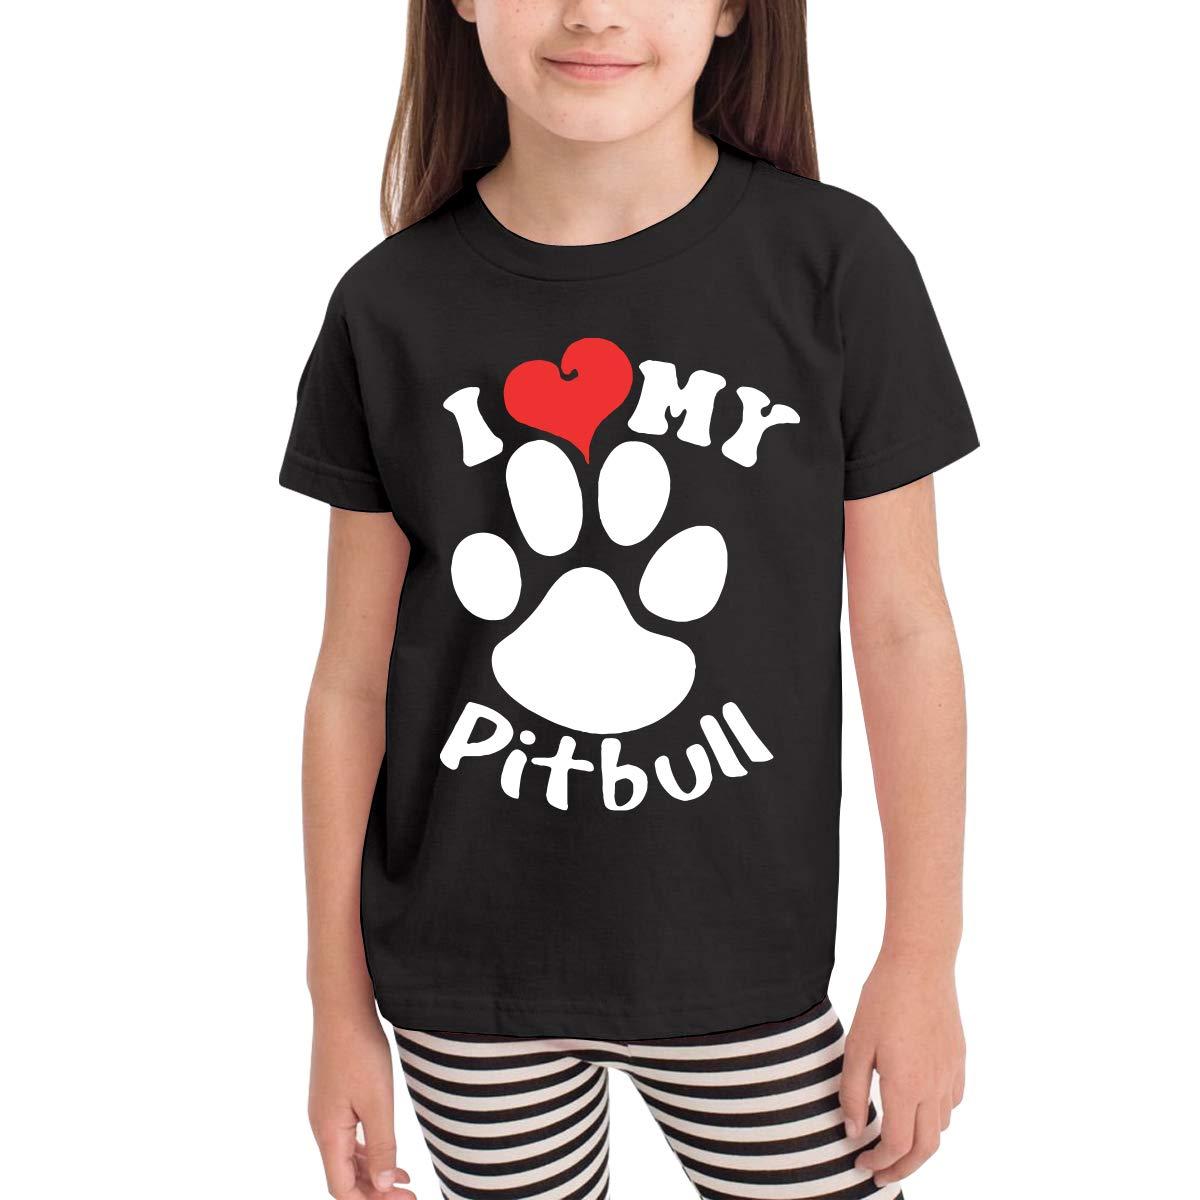 Little Boys I Love My Pitbull Soft Short Sleeve Tee Tops Size 2-6